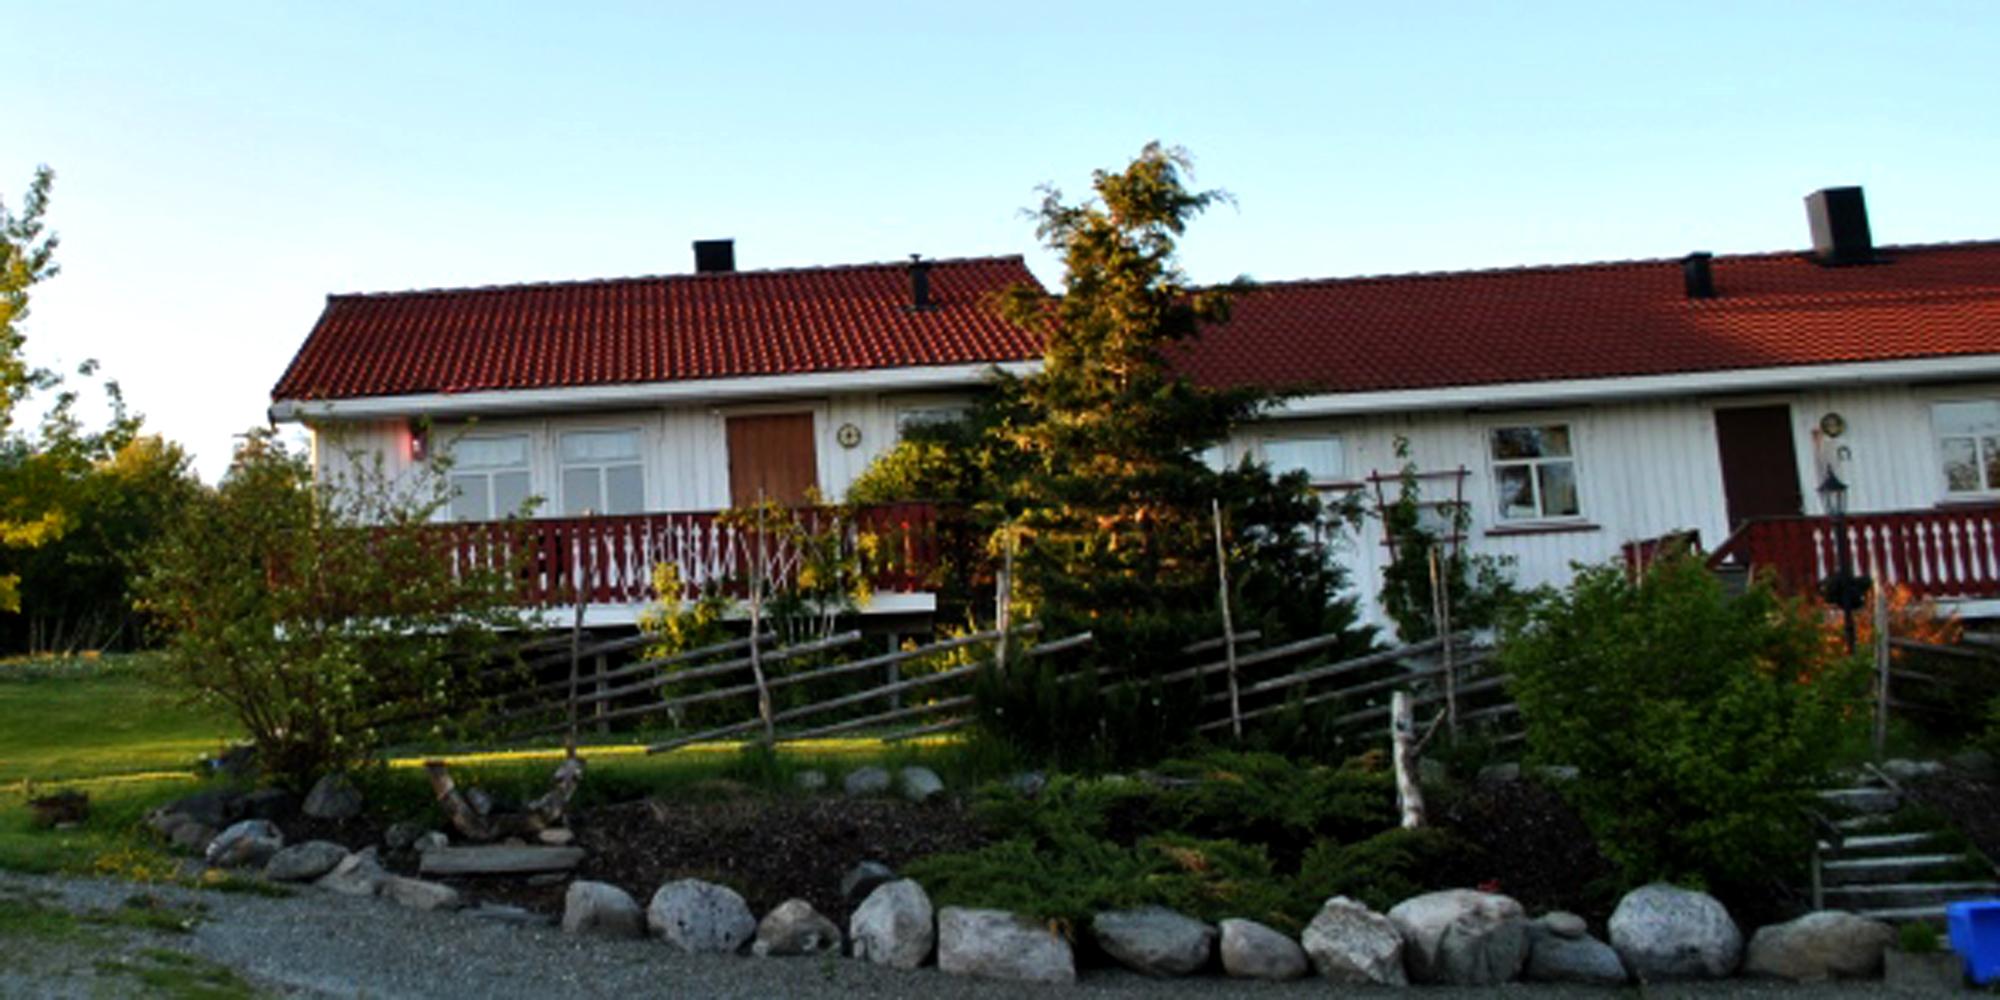 Letnes gård, Meisereiret